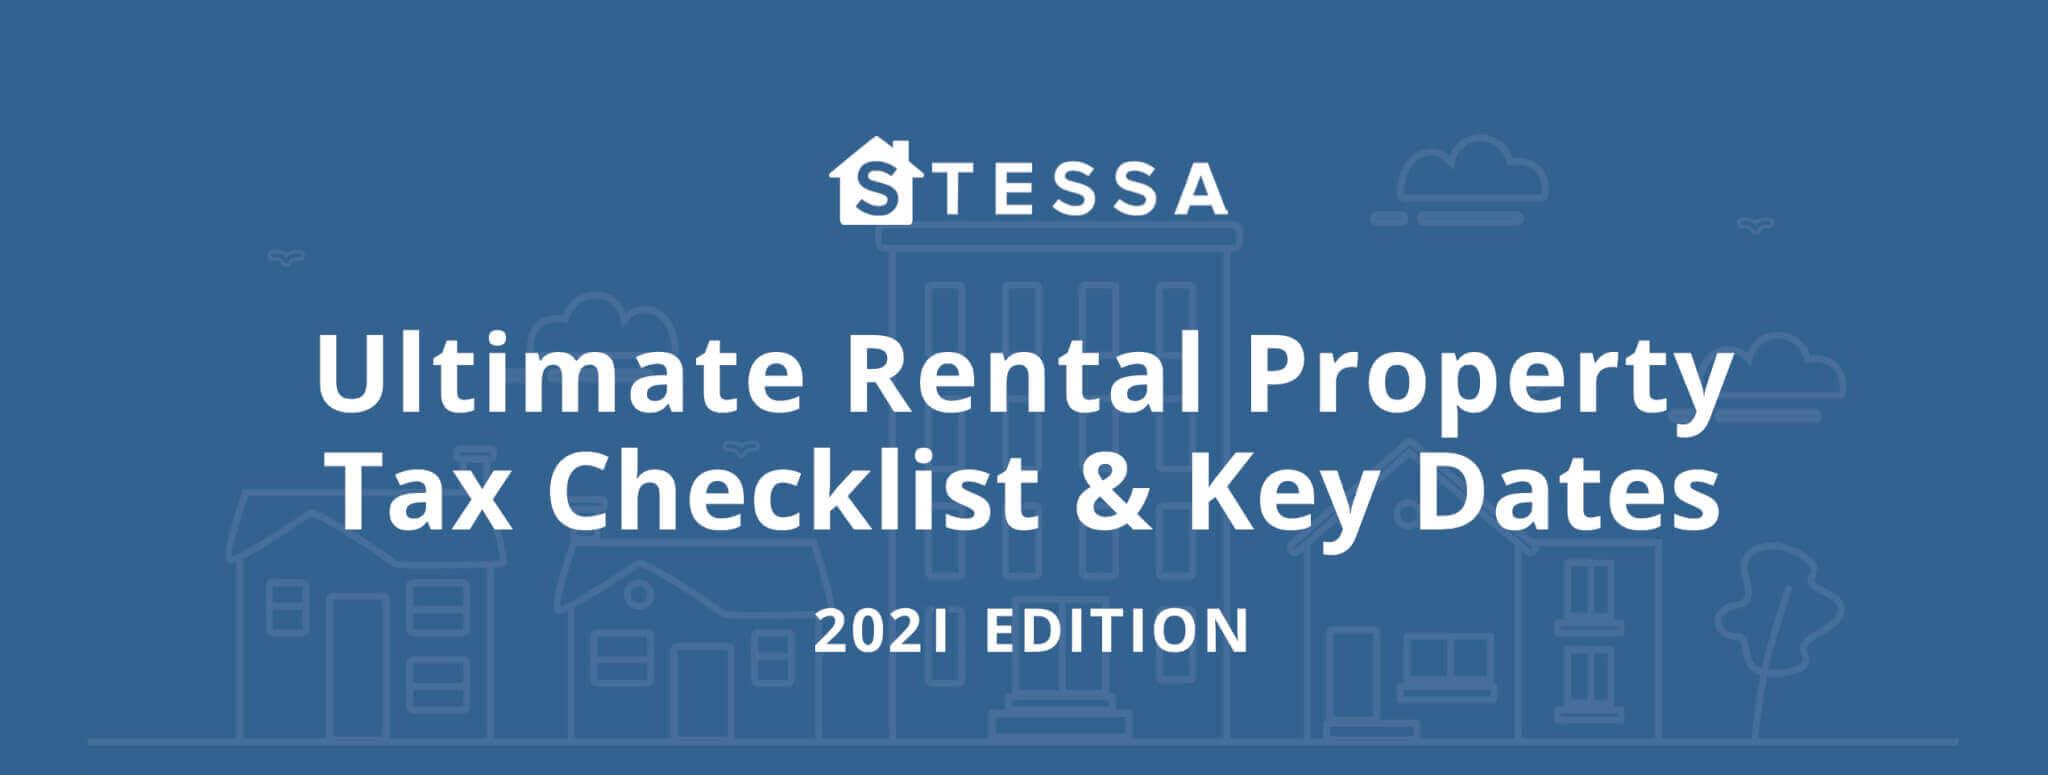 Key 2021 tax deadlines & check list for real estate investors